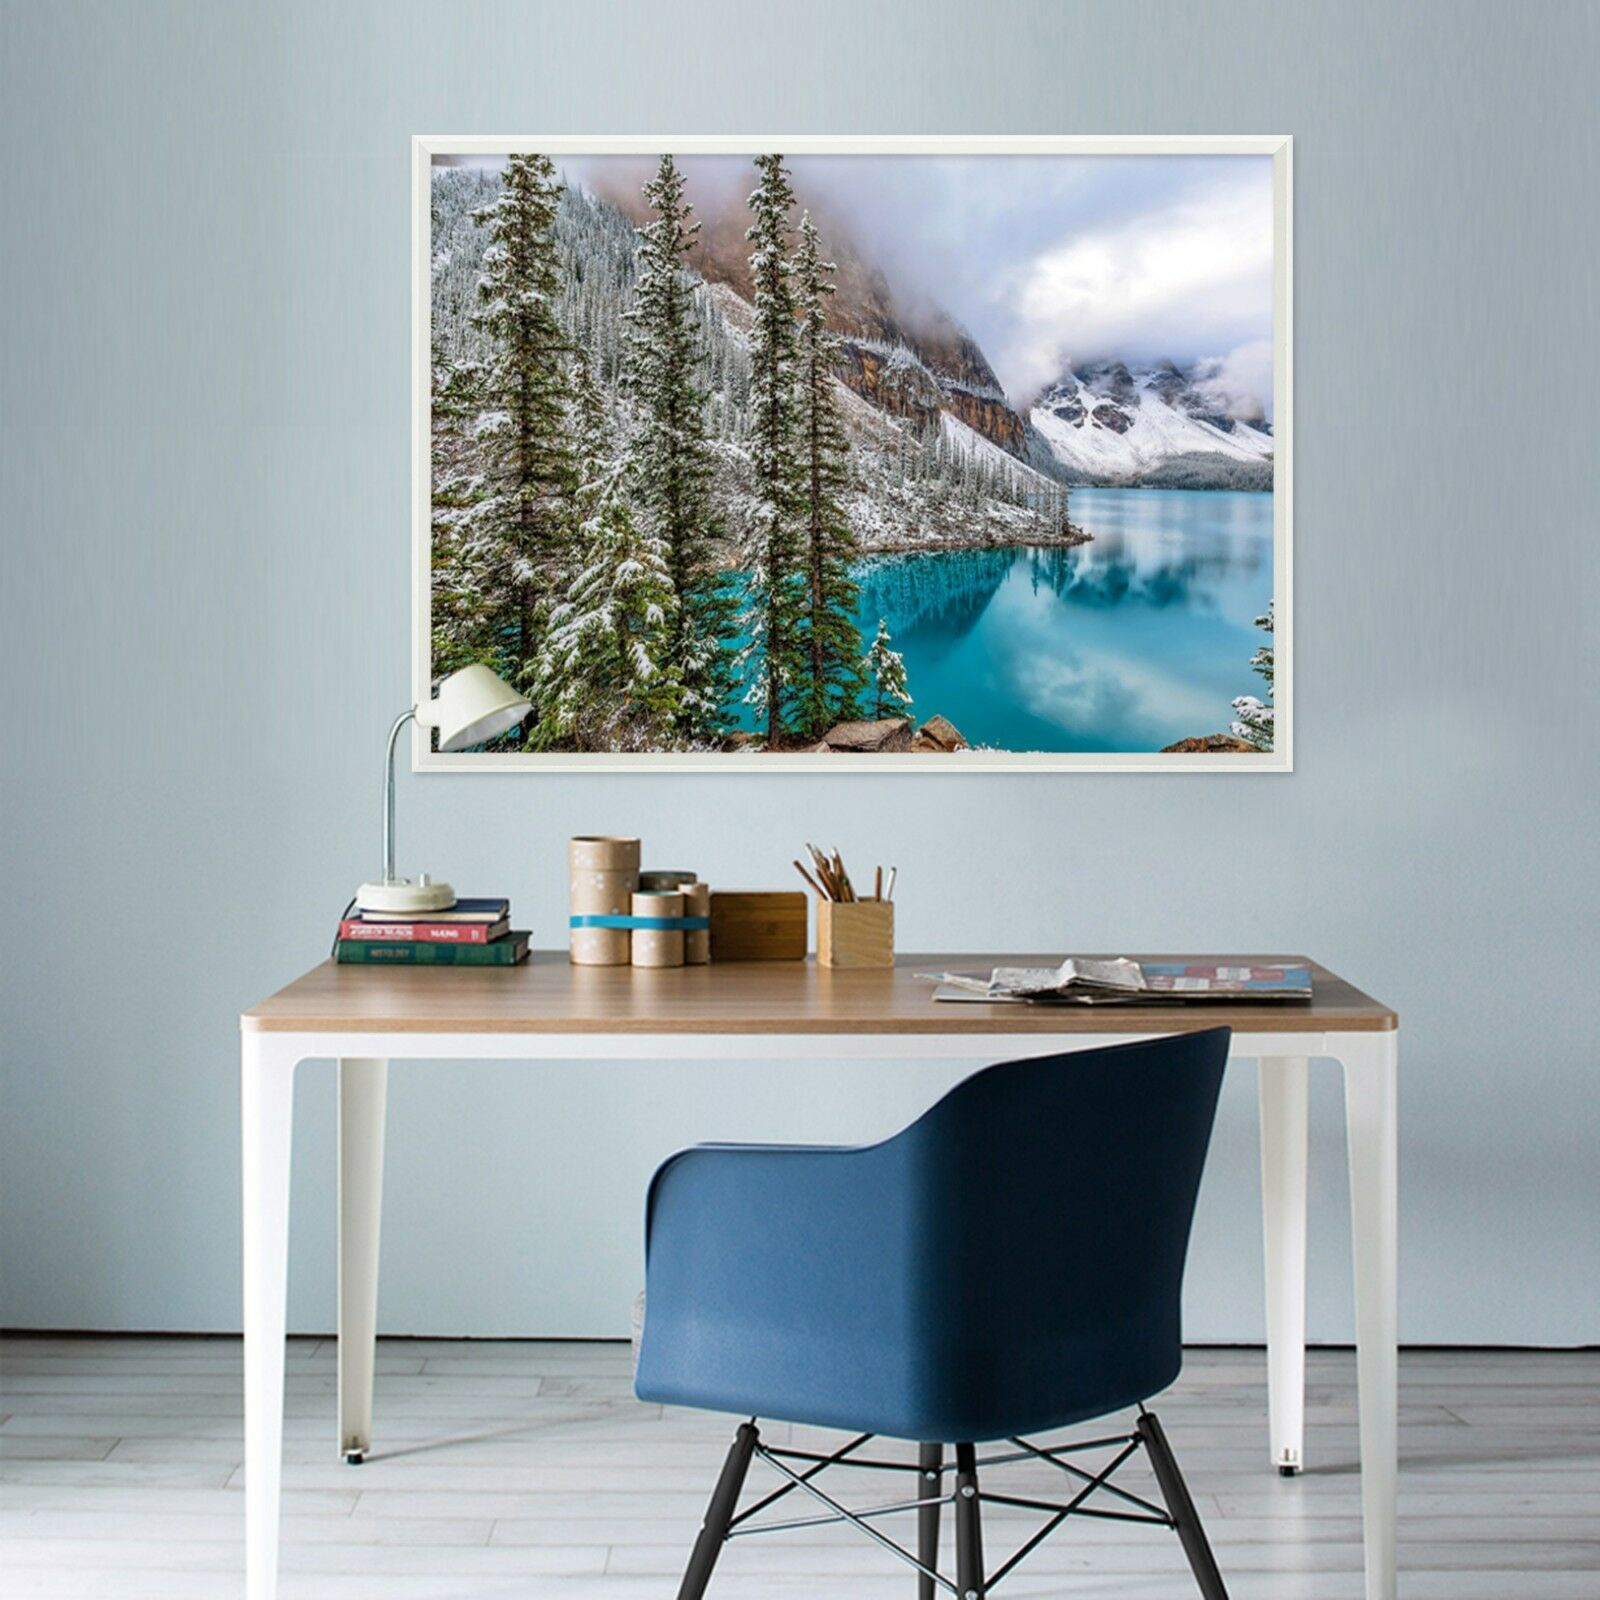 3D Snow Tree Hills Lake 2 Framed Poster Home Decor Print Painting Art WALLPAPER